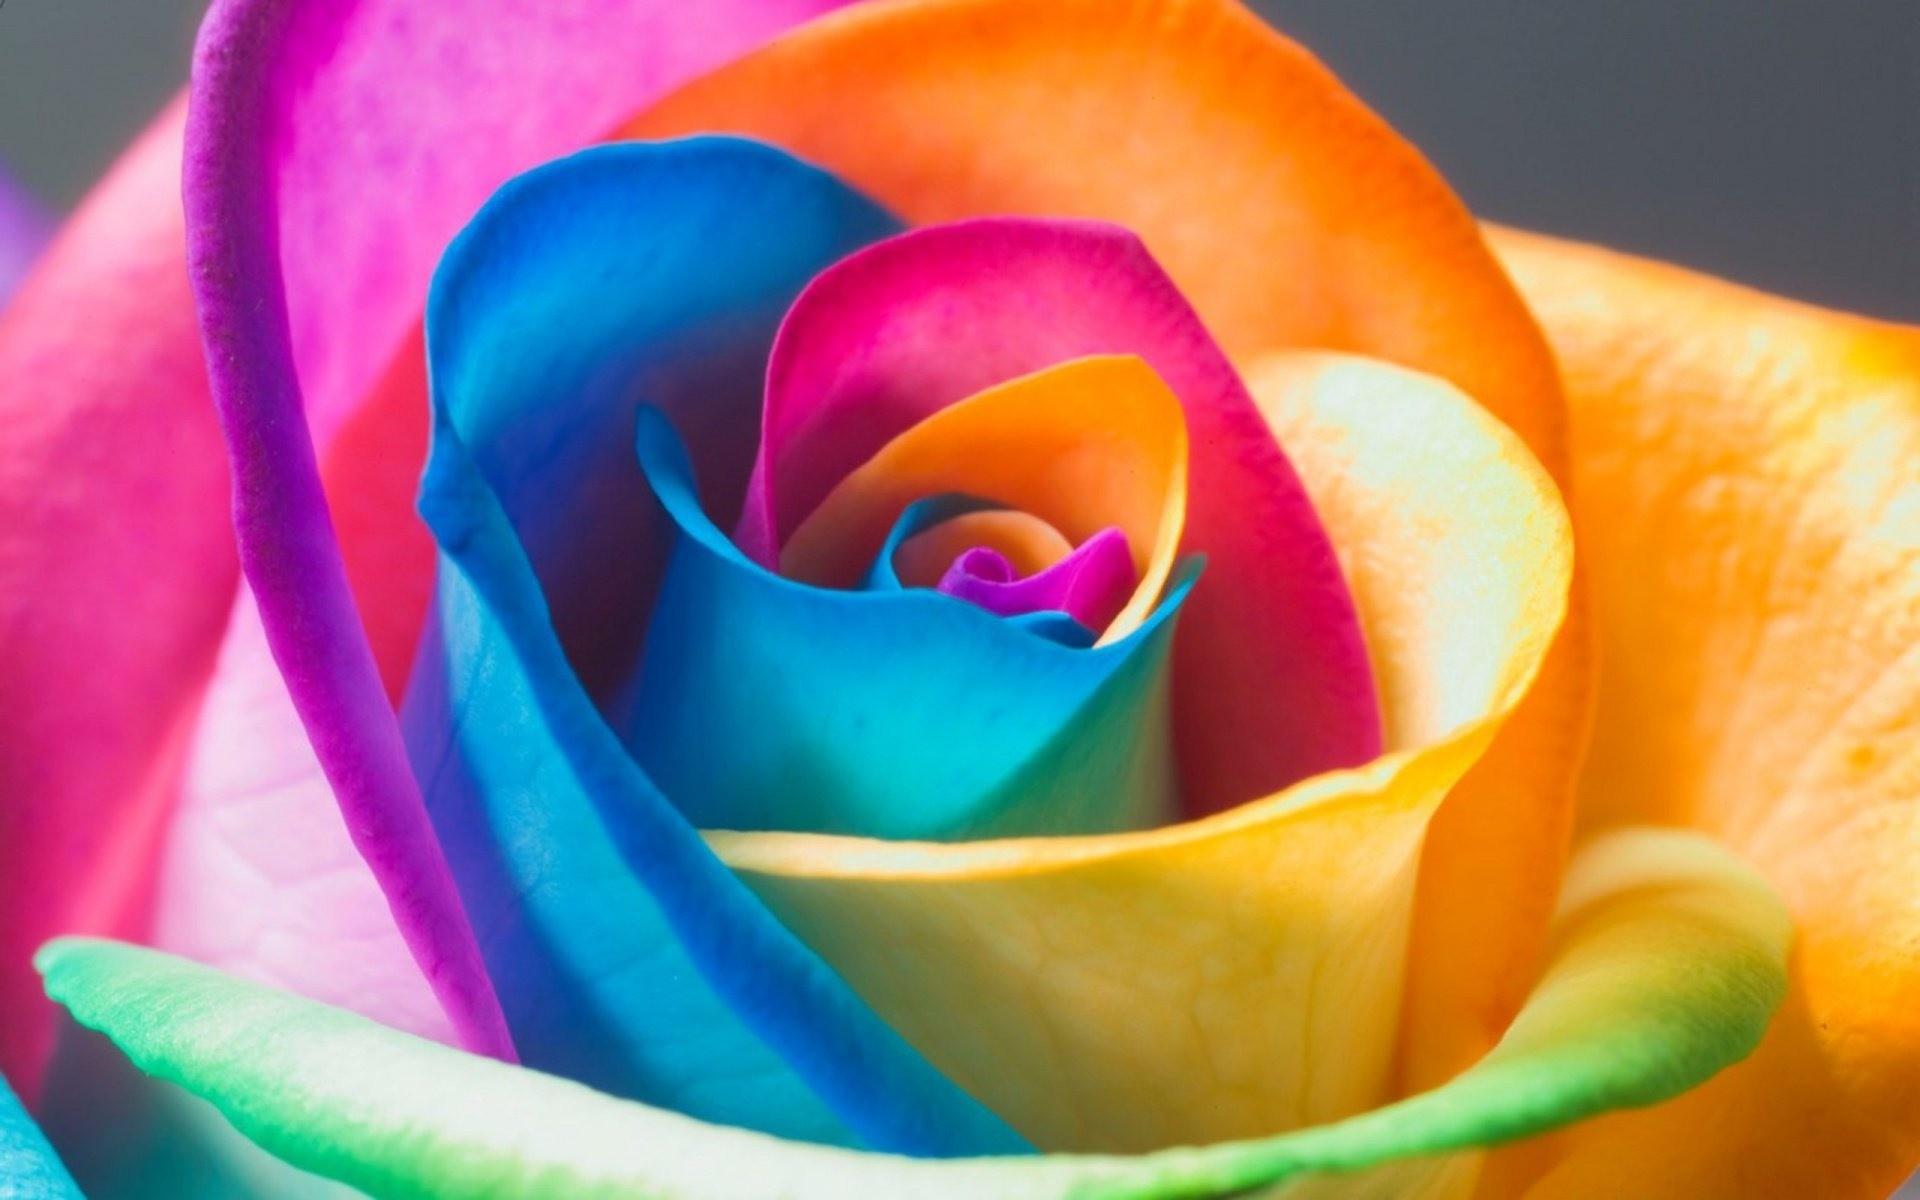 1920x1200 Rainbow Flower Wallpaper Desktop Hd On WallpaperGet